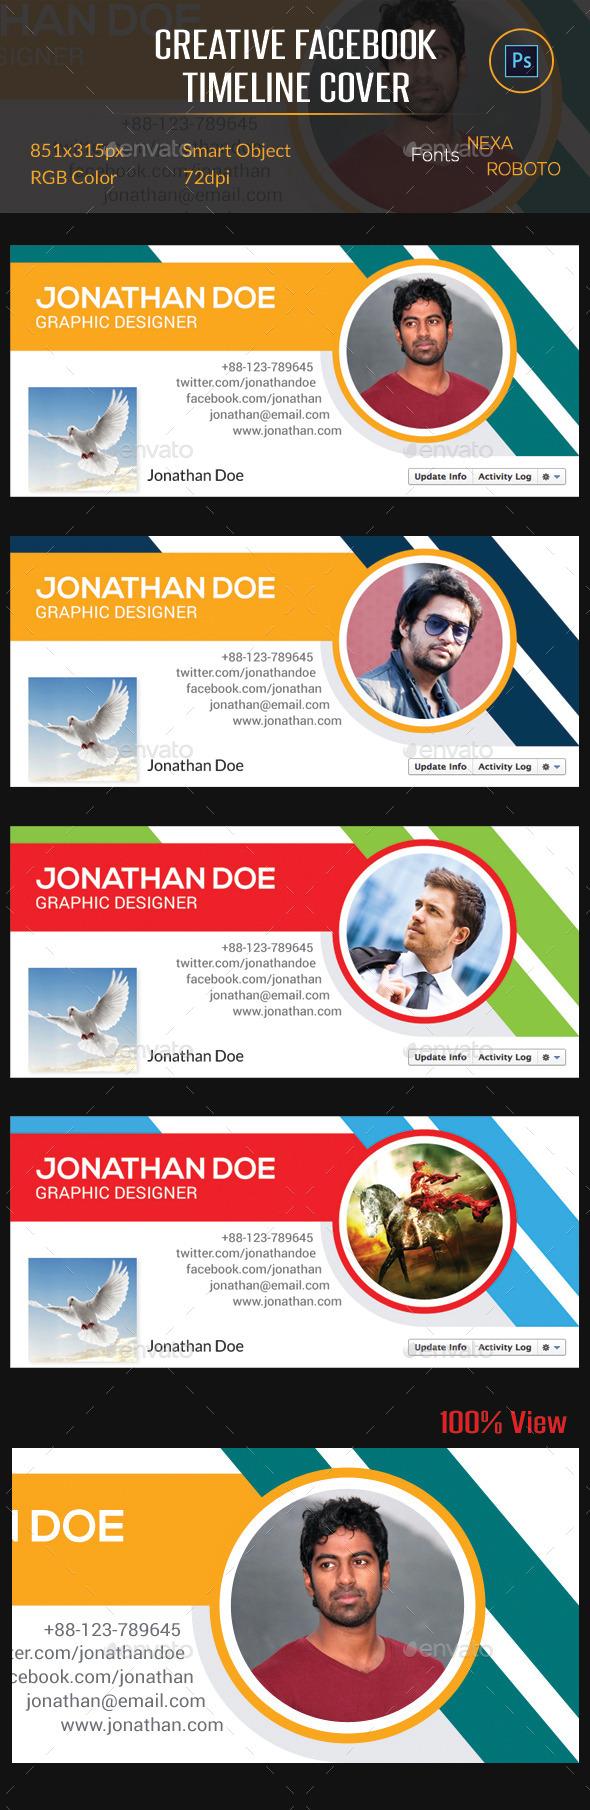 GraphicRiver Creative Facebook Timeline Cover 10134049